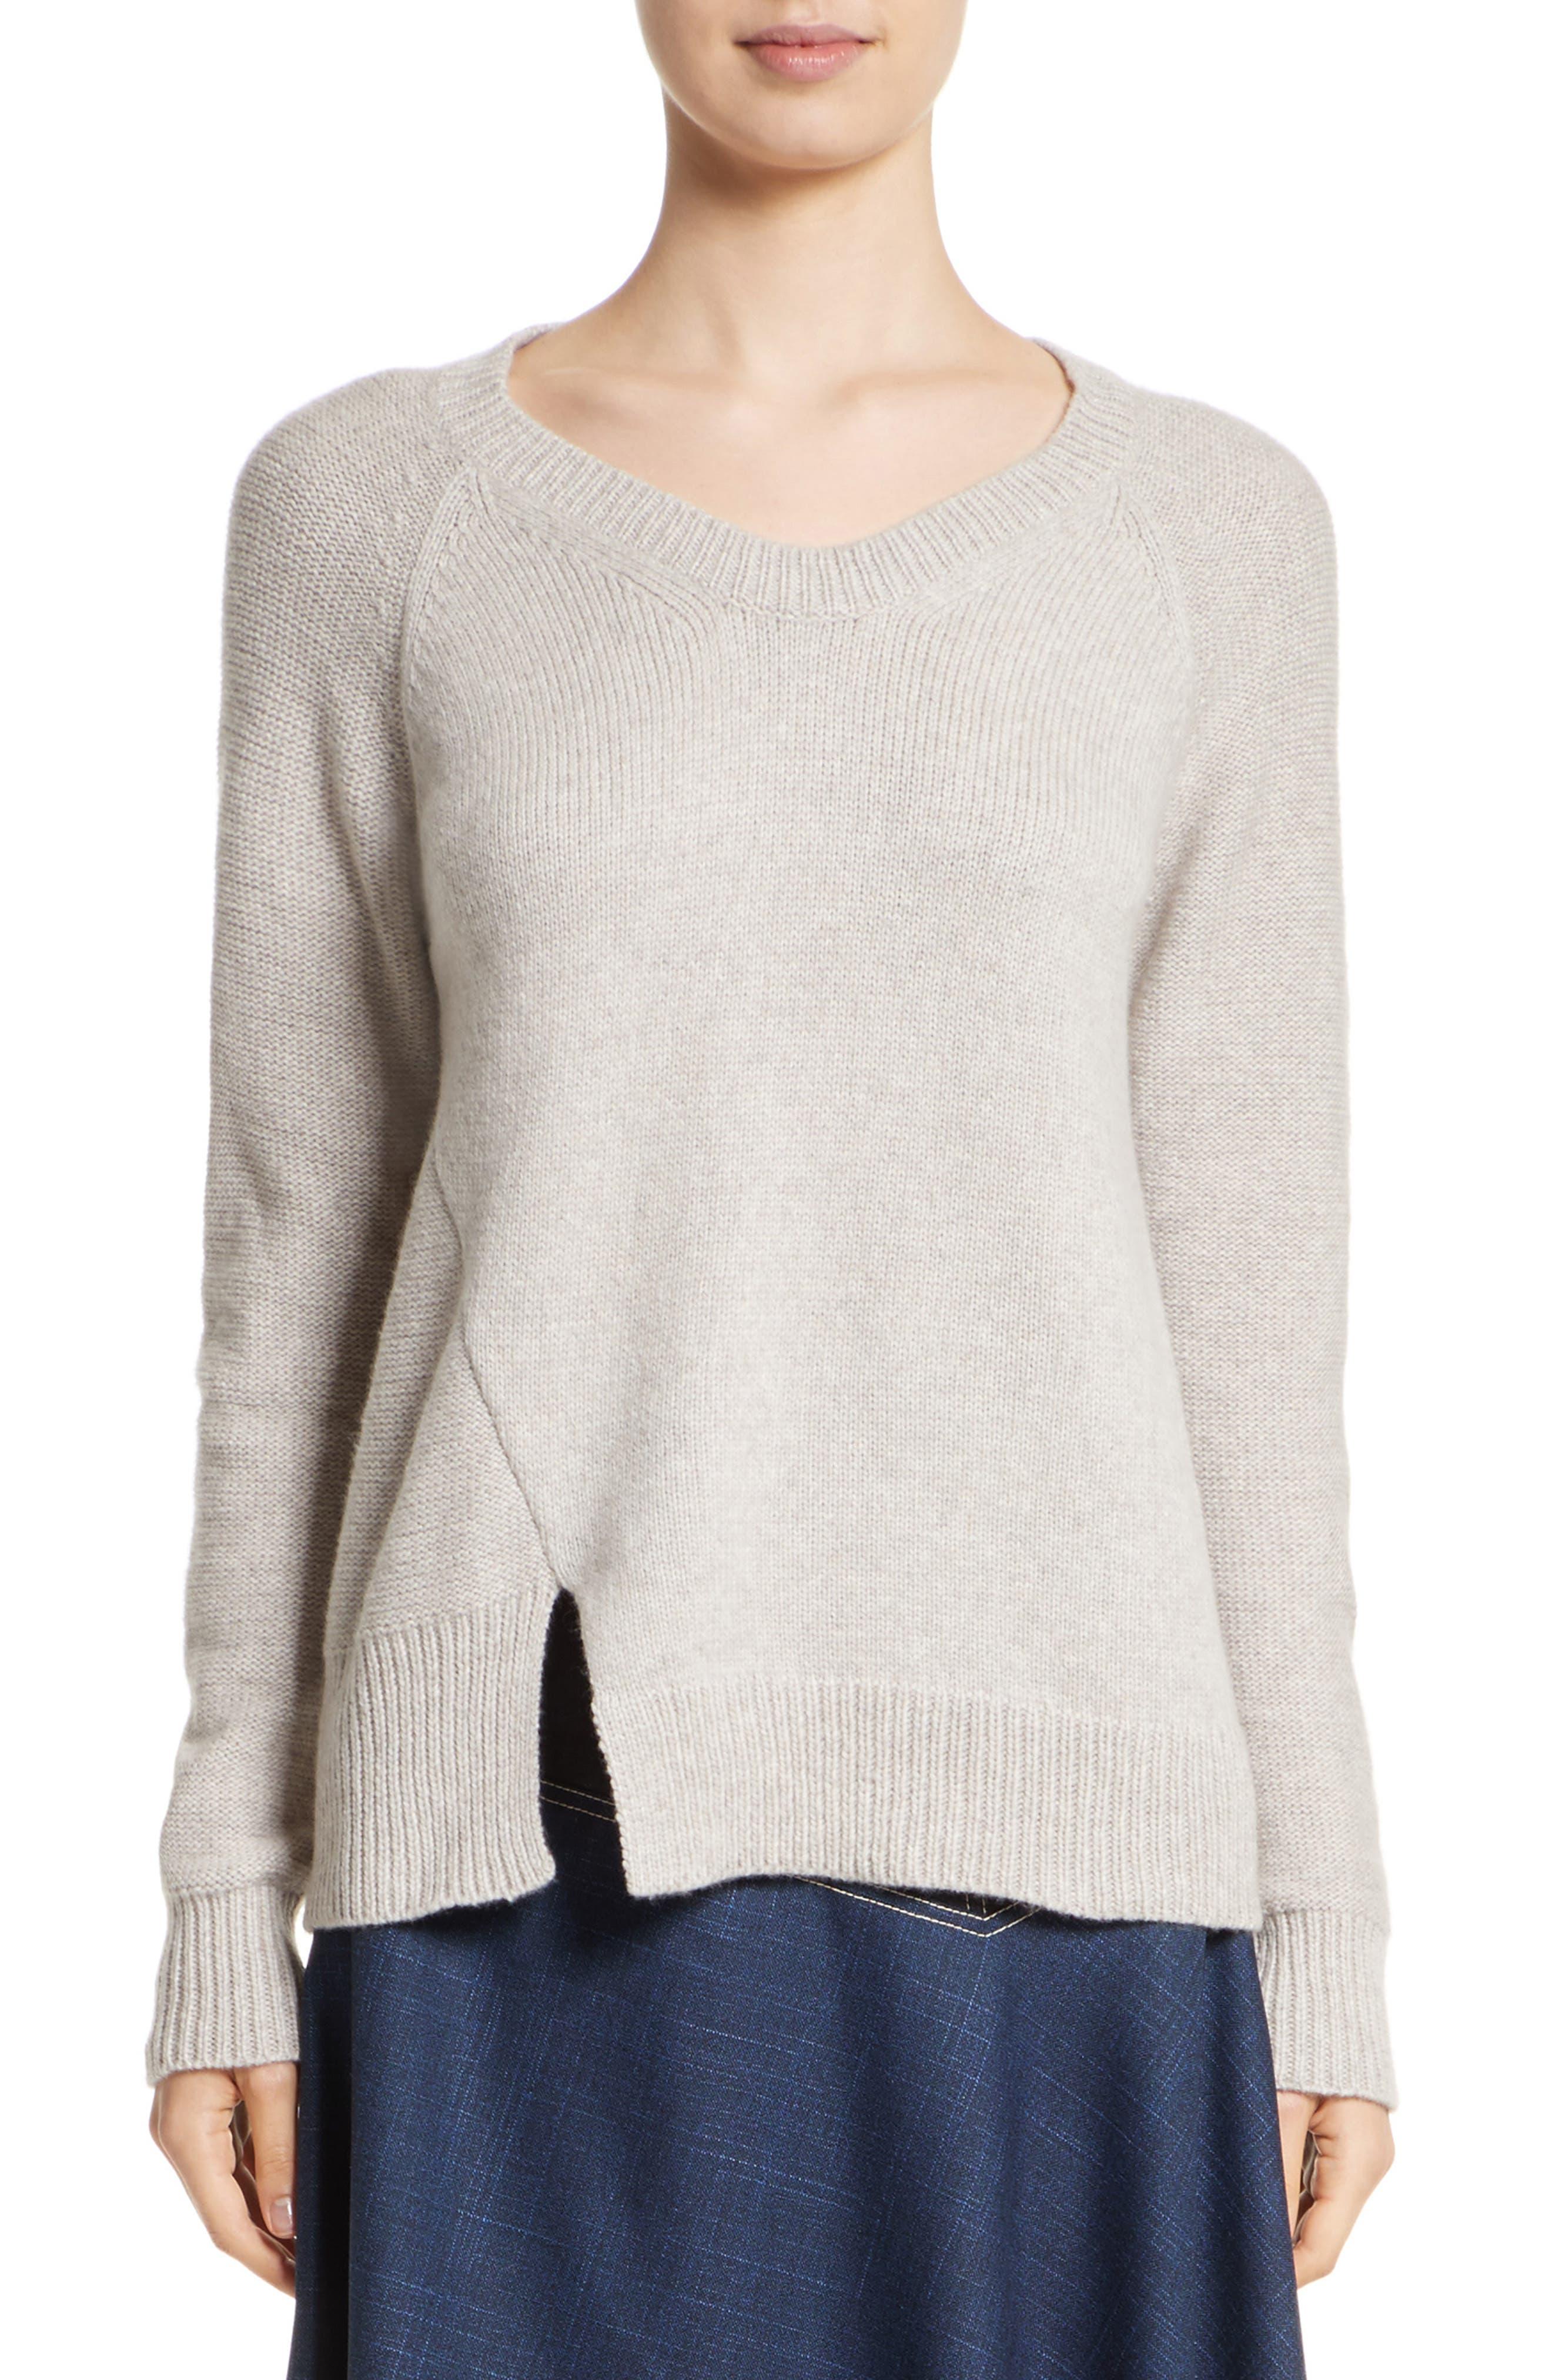 Colovos Asymmetrical Wide Neck Sweater